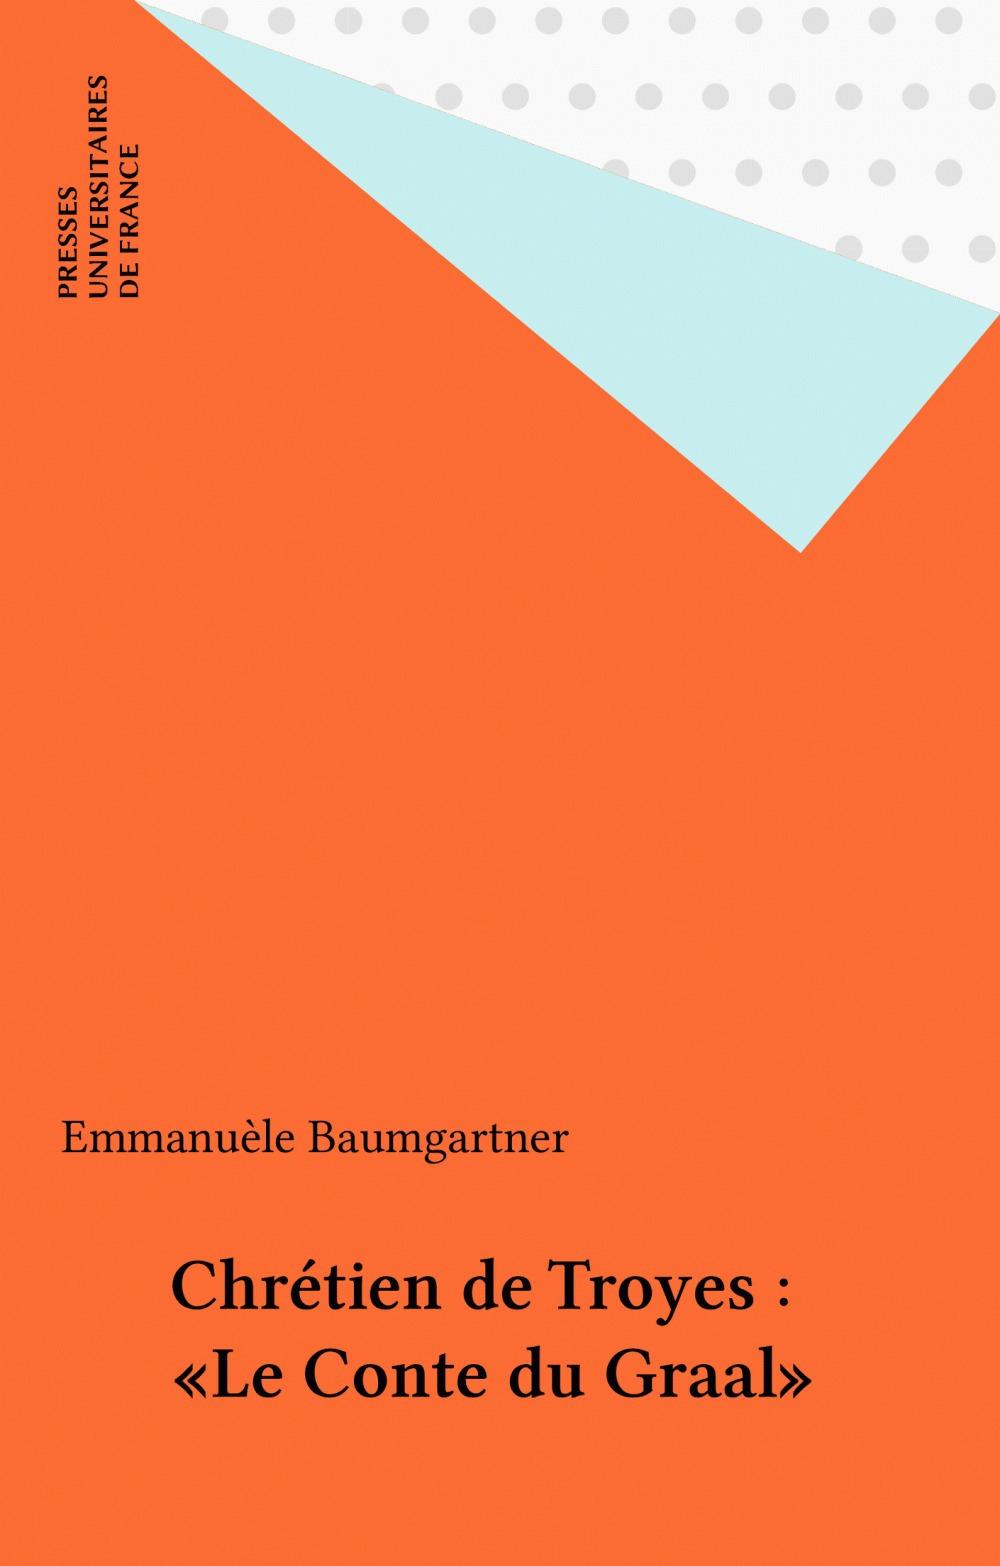 Emmanuèle Baumgartner Chrétien de Troyes : «Le Conte du Graal»